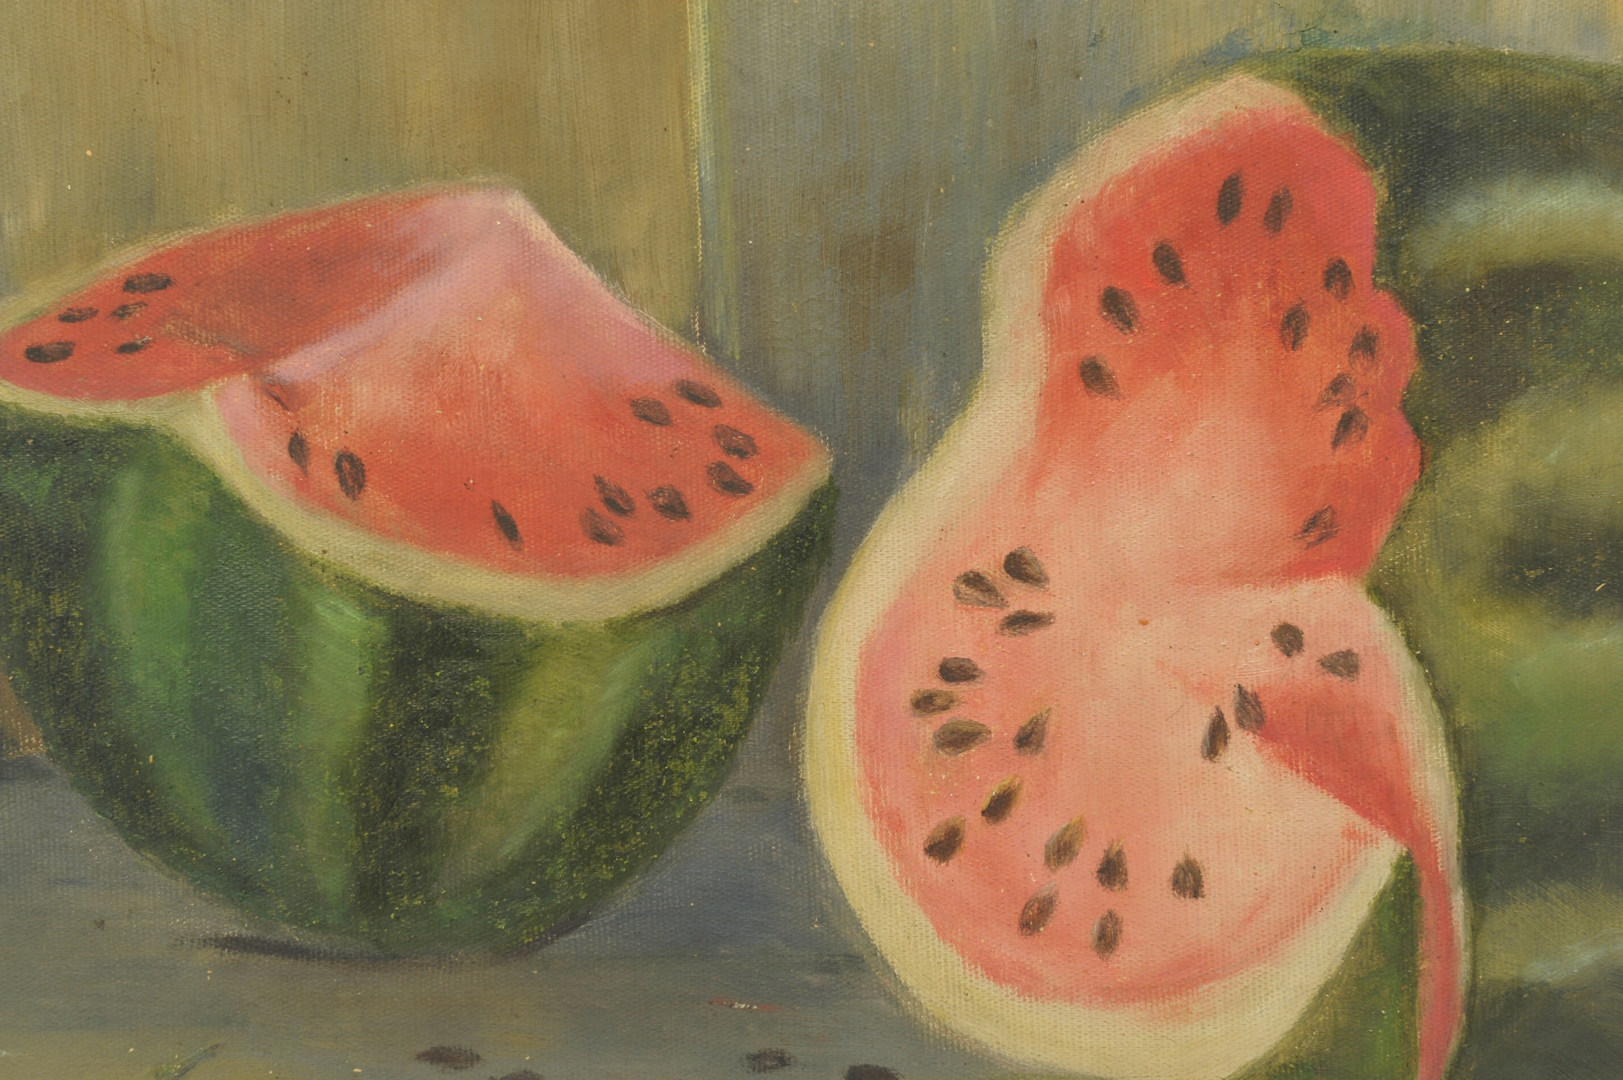 Lot 372: Folk Art Watermelon Oil on Canvas Still Life